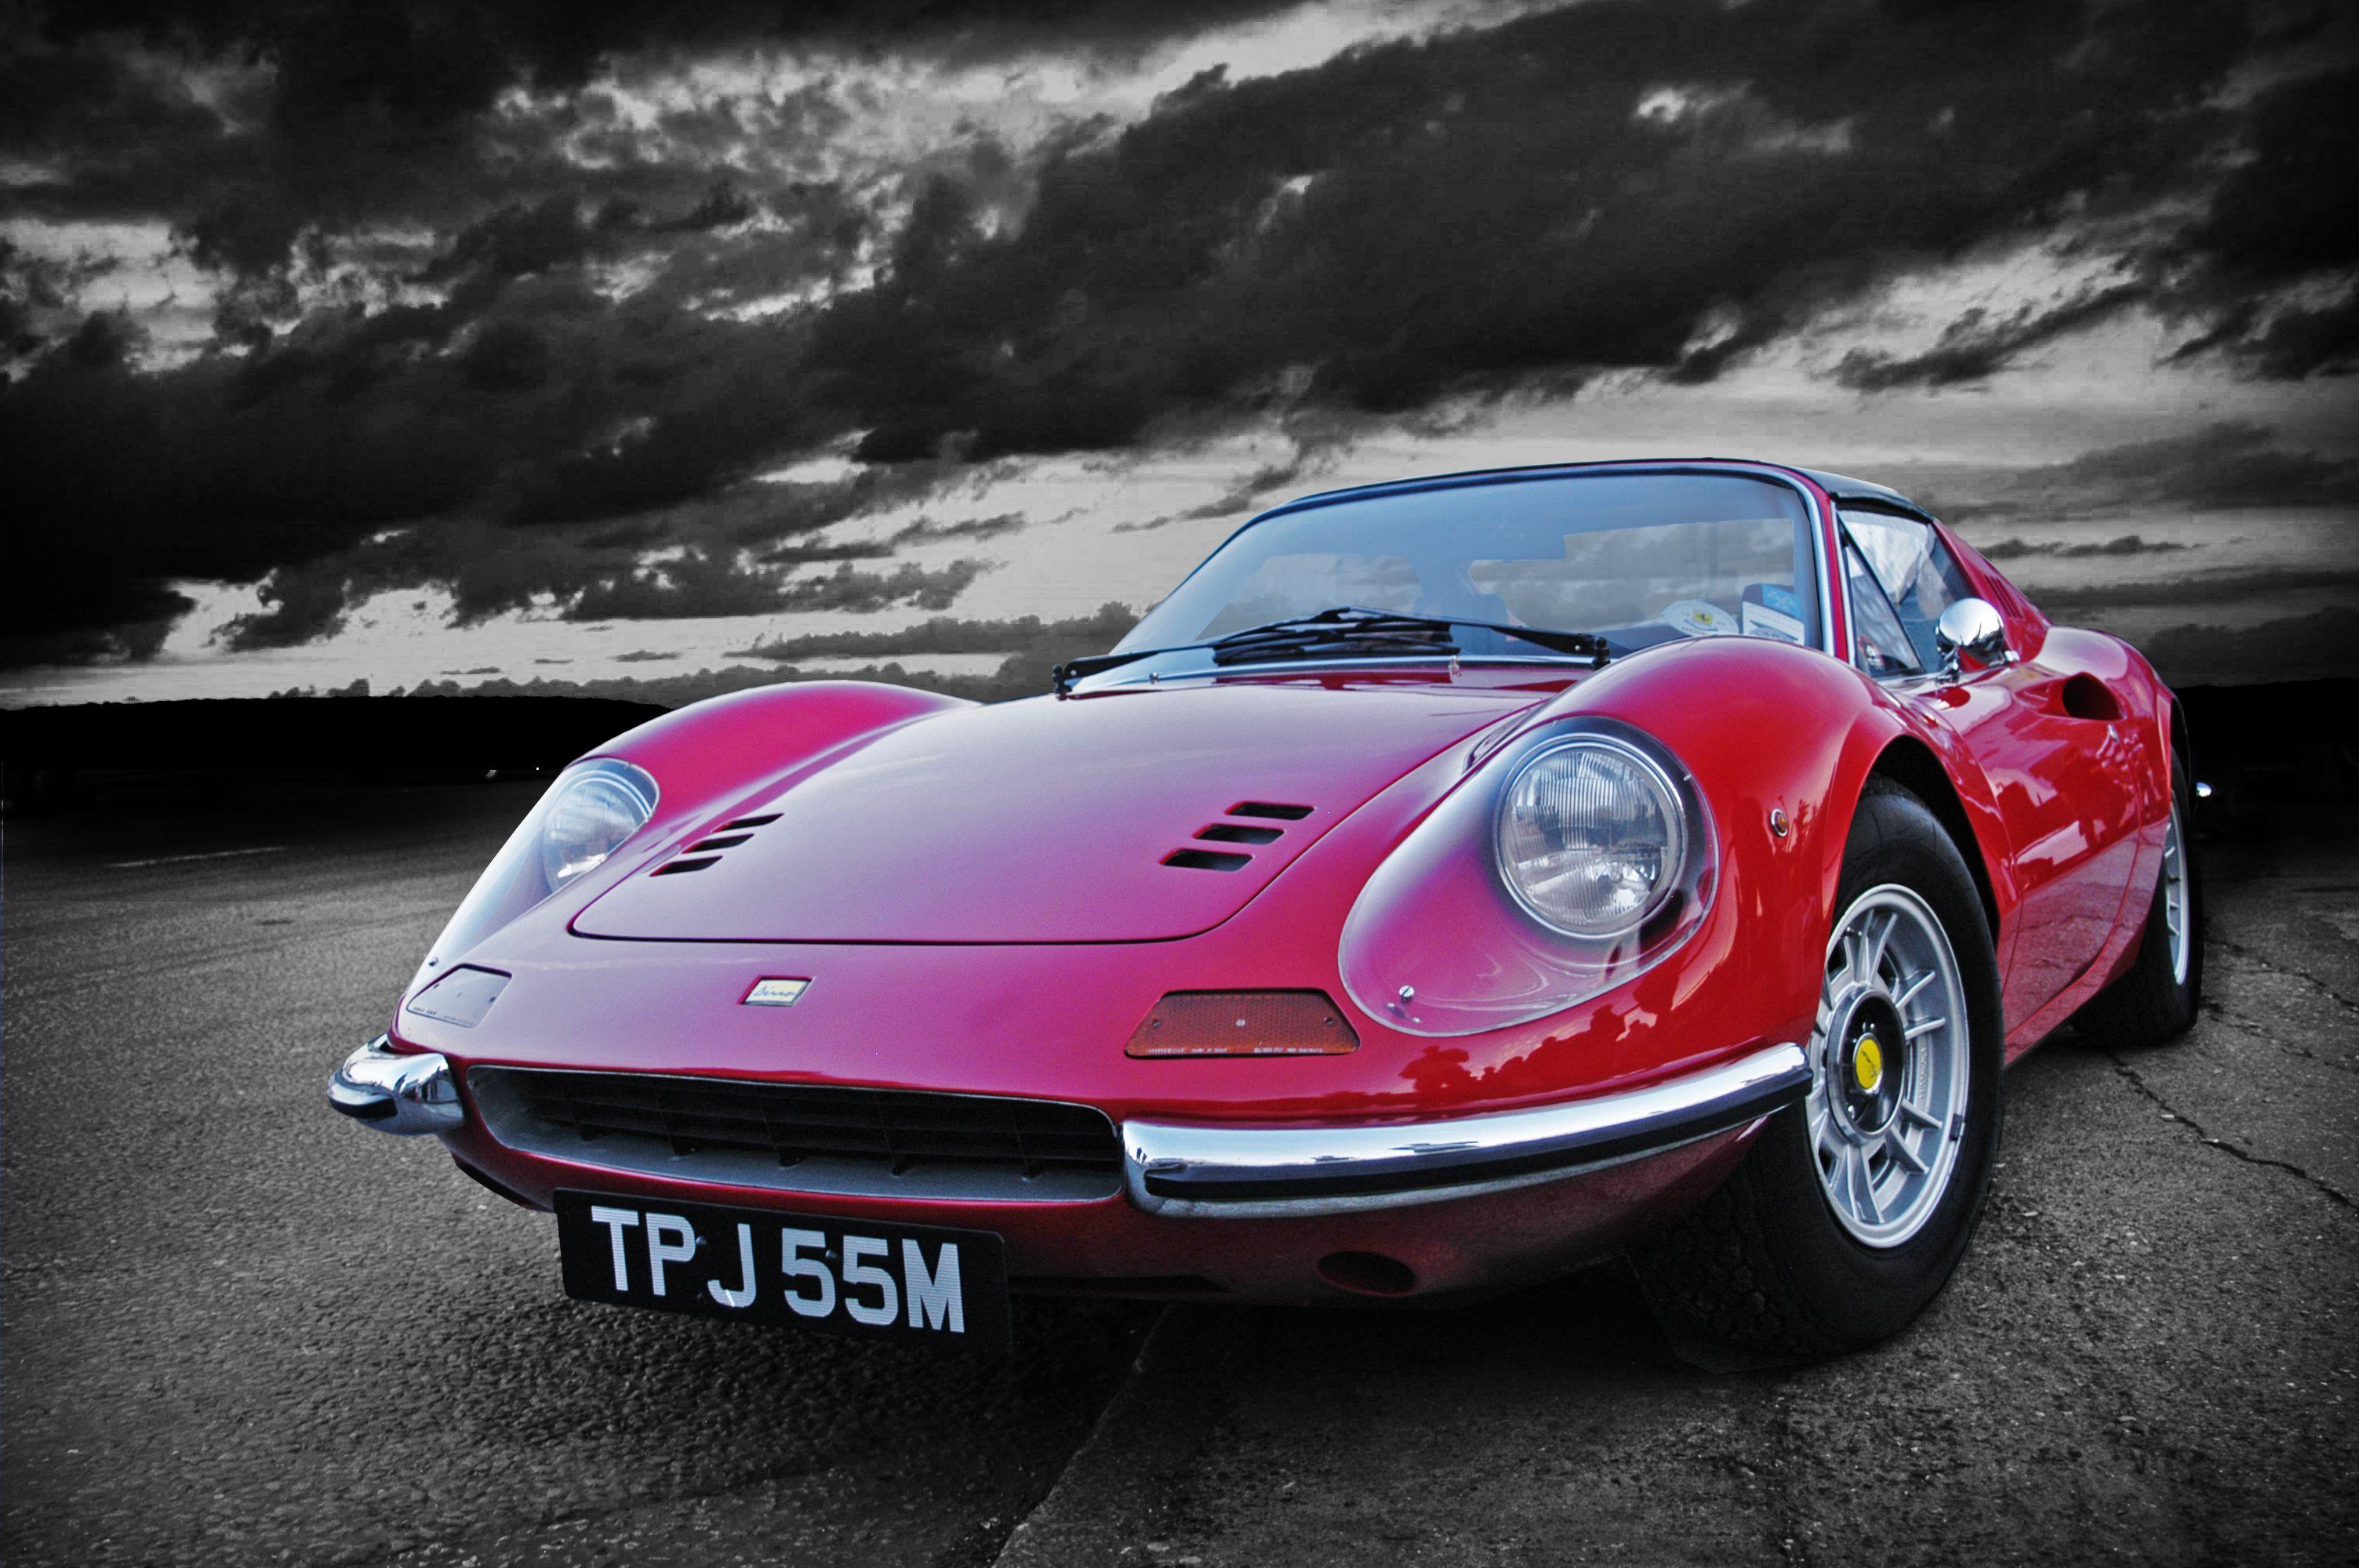 Free Download Creative Vintage Ferrari Images